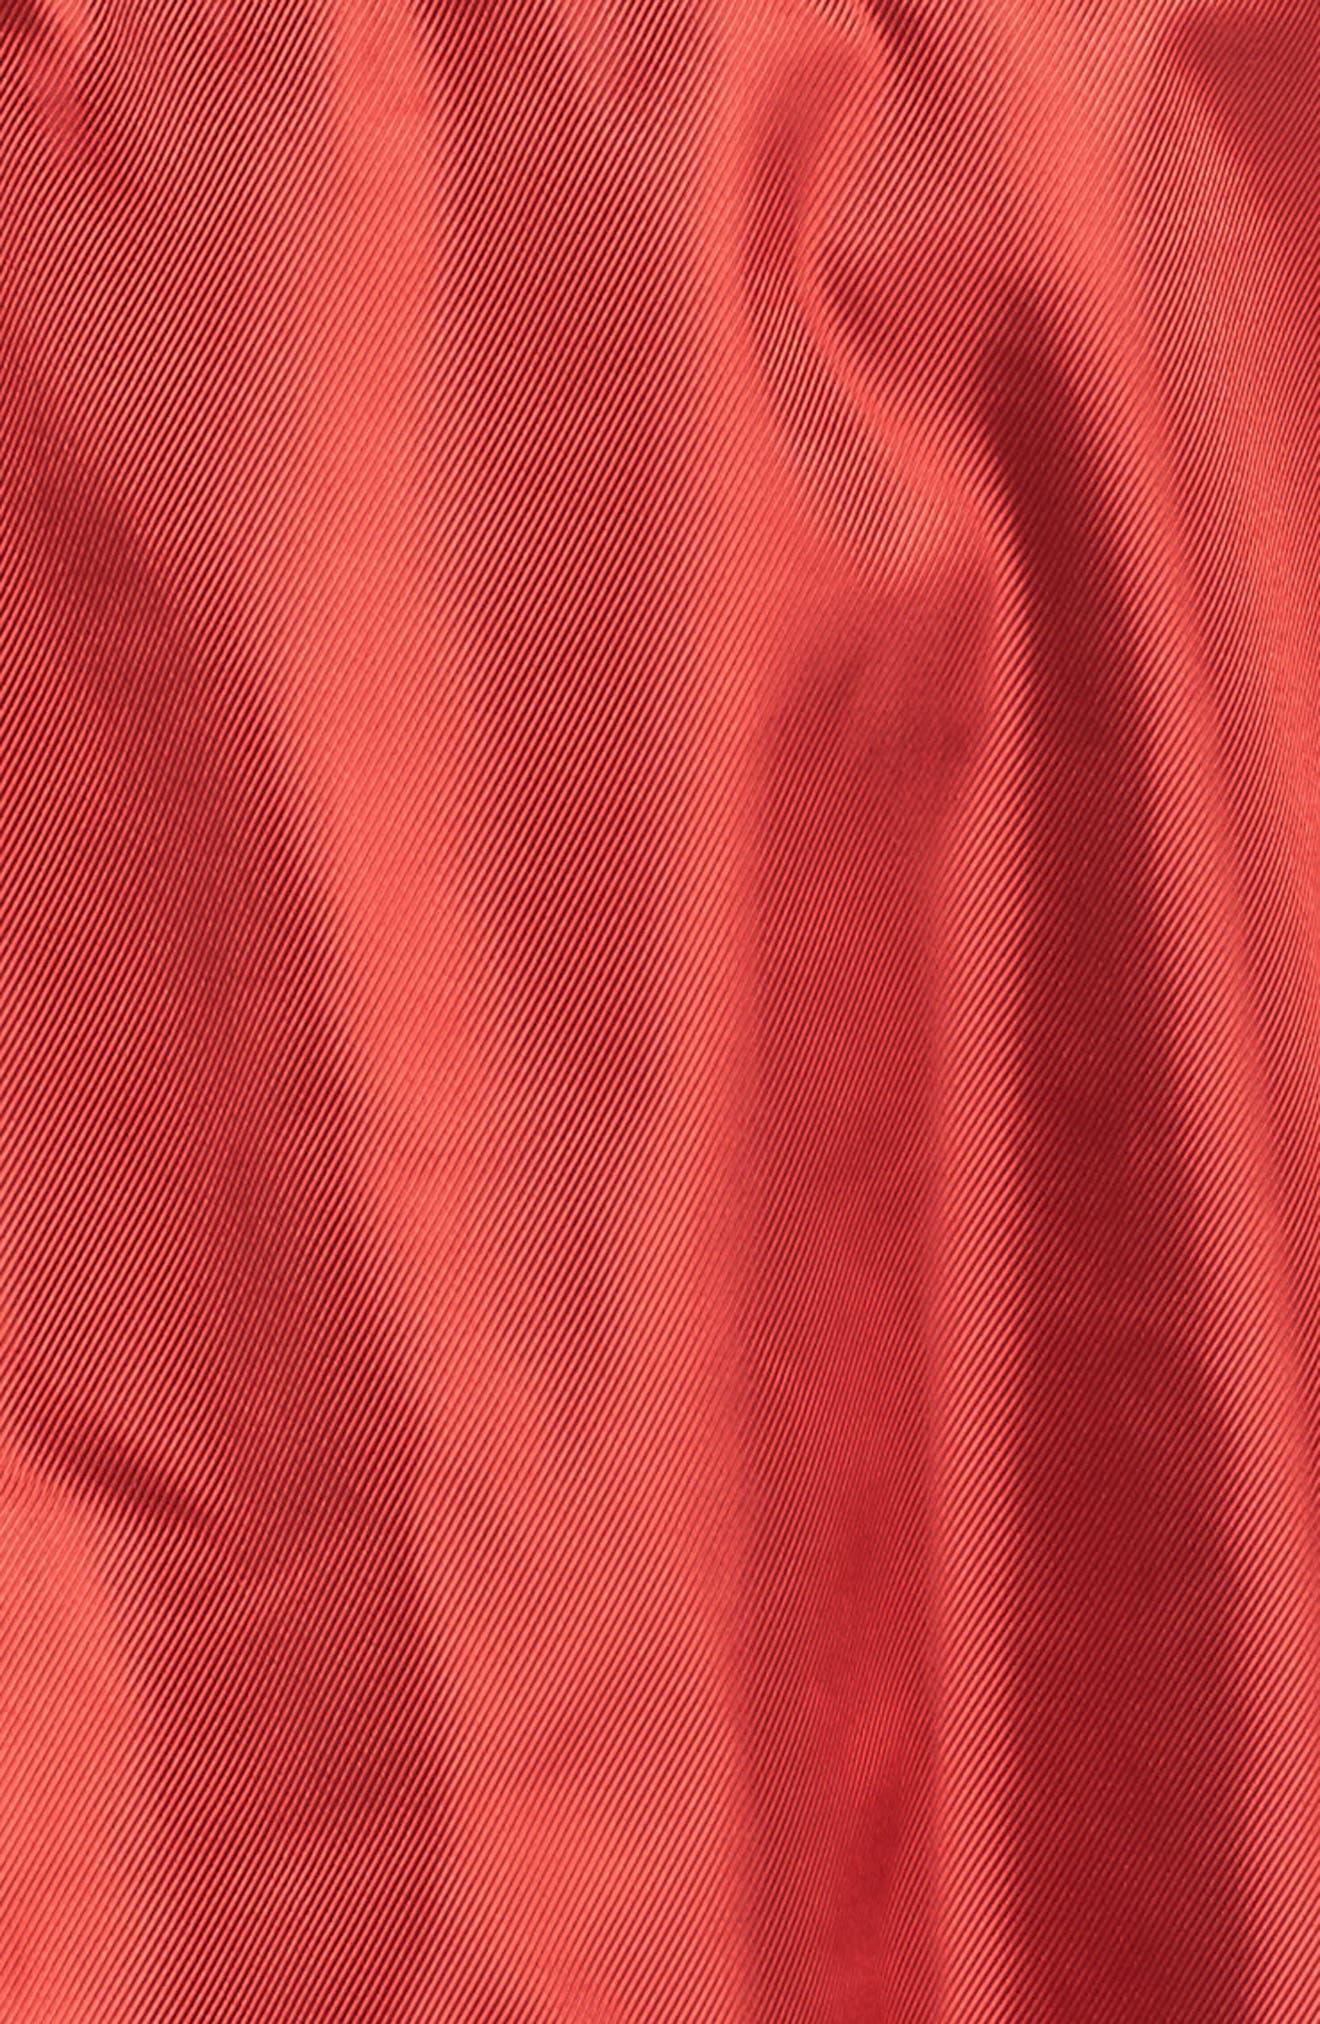 NikeLab Collection Satin Half Zip Top,                             Alternate thumbnail 6, color,                             Gym Red/ Black